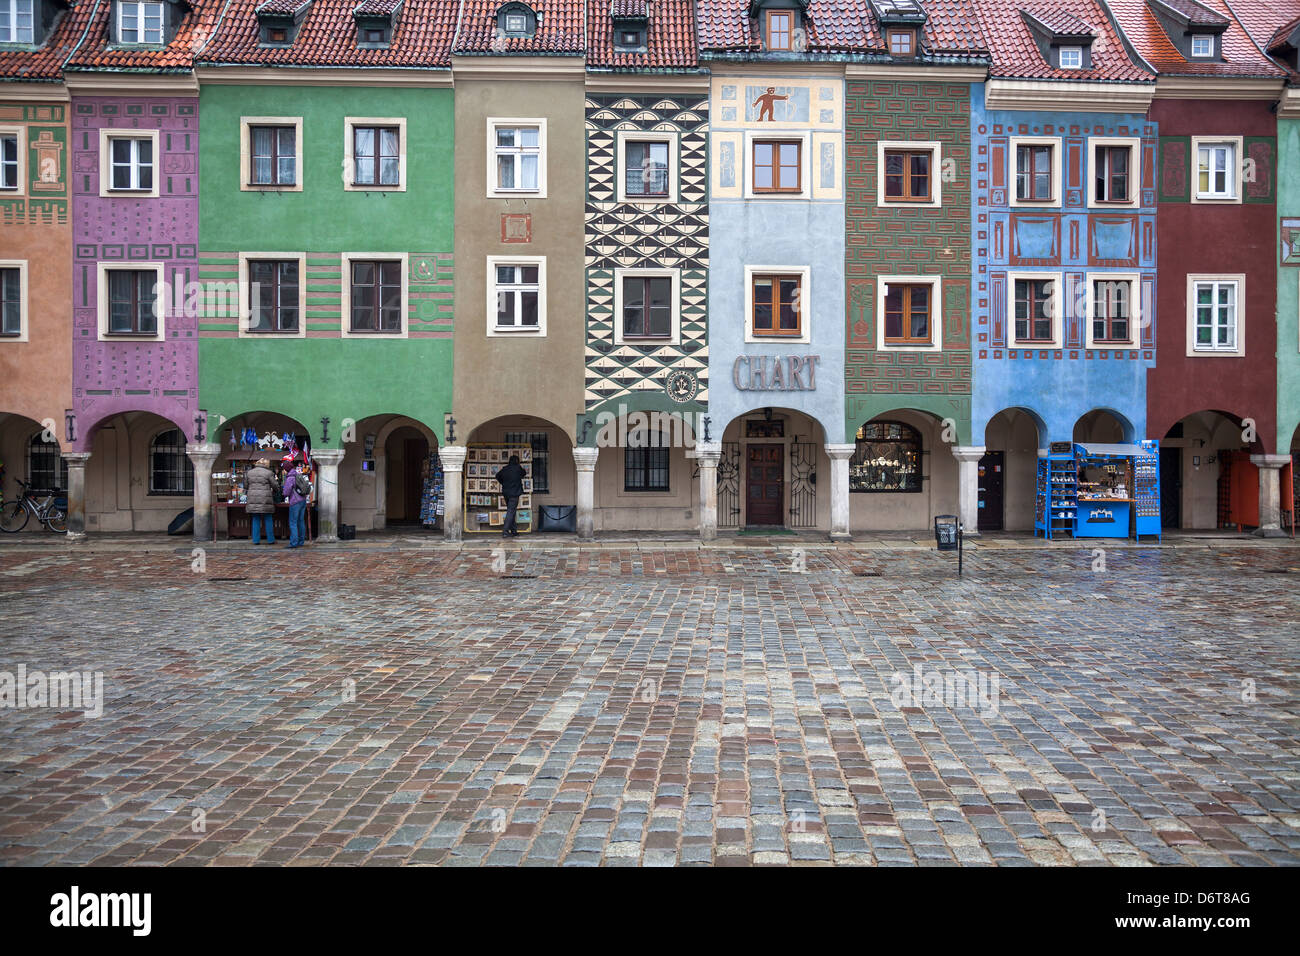 16th century medieval merchants' houses, domki budnicze, old town square, Stary Rynek, Poznan, Poland - Stock Image